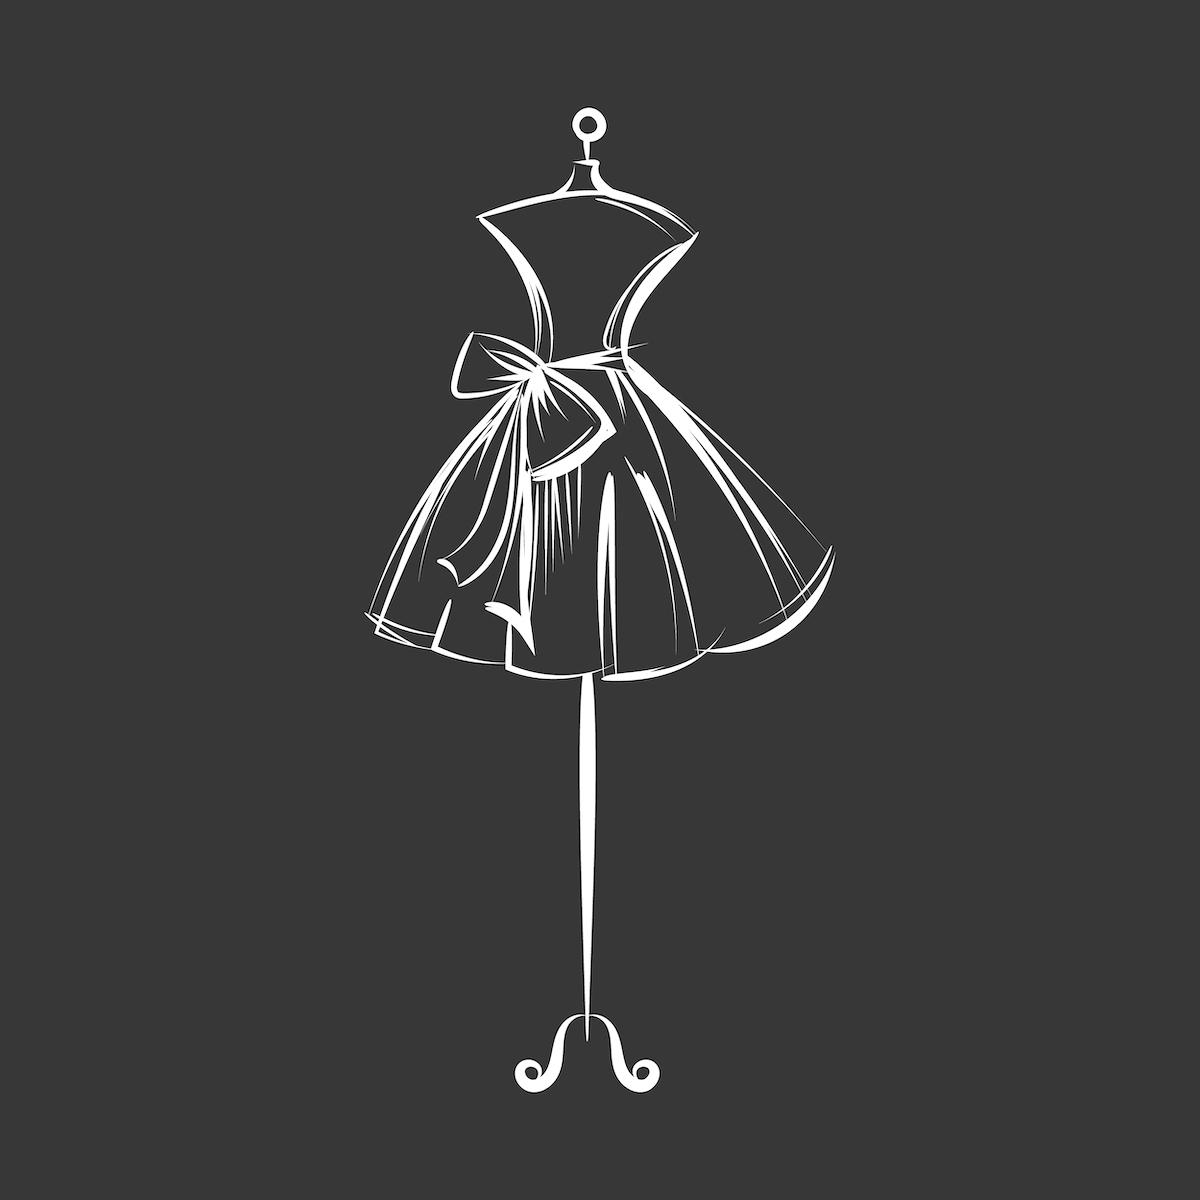 Petite robe noire ©De Taxiro. shutterstock